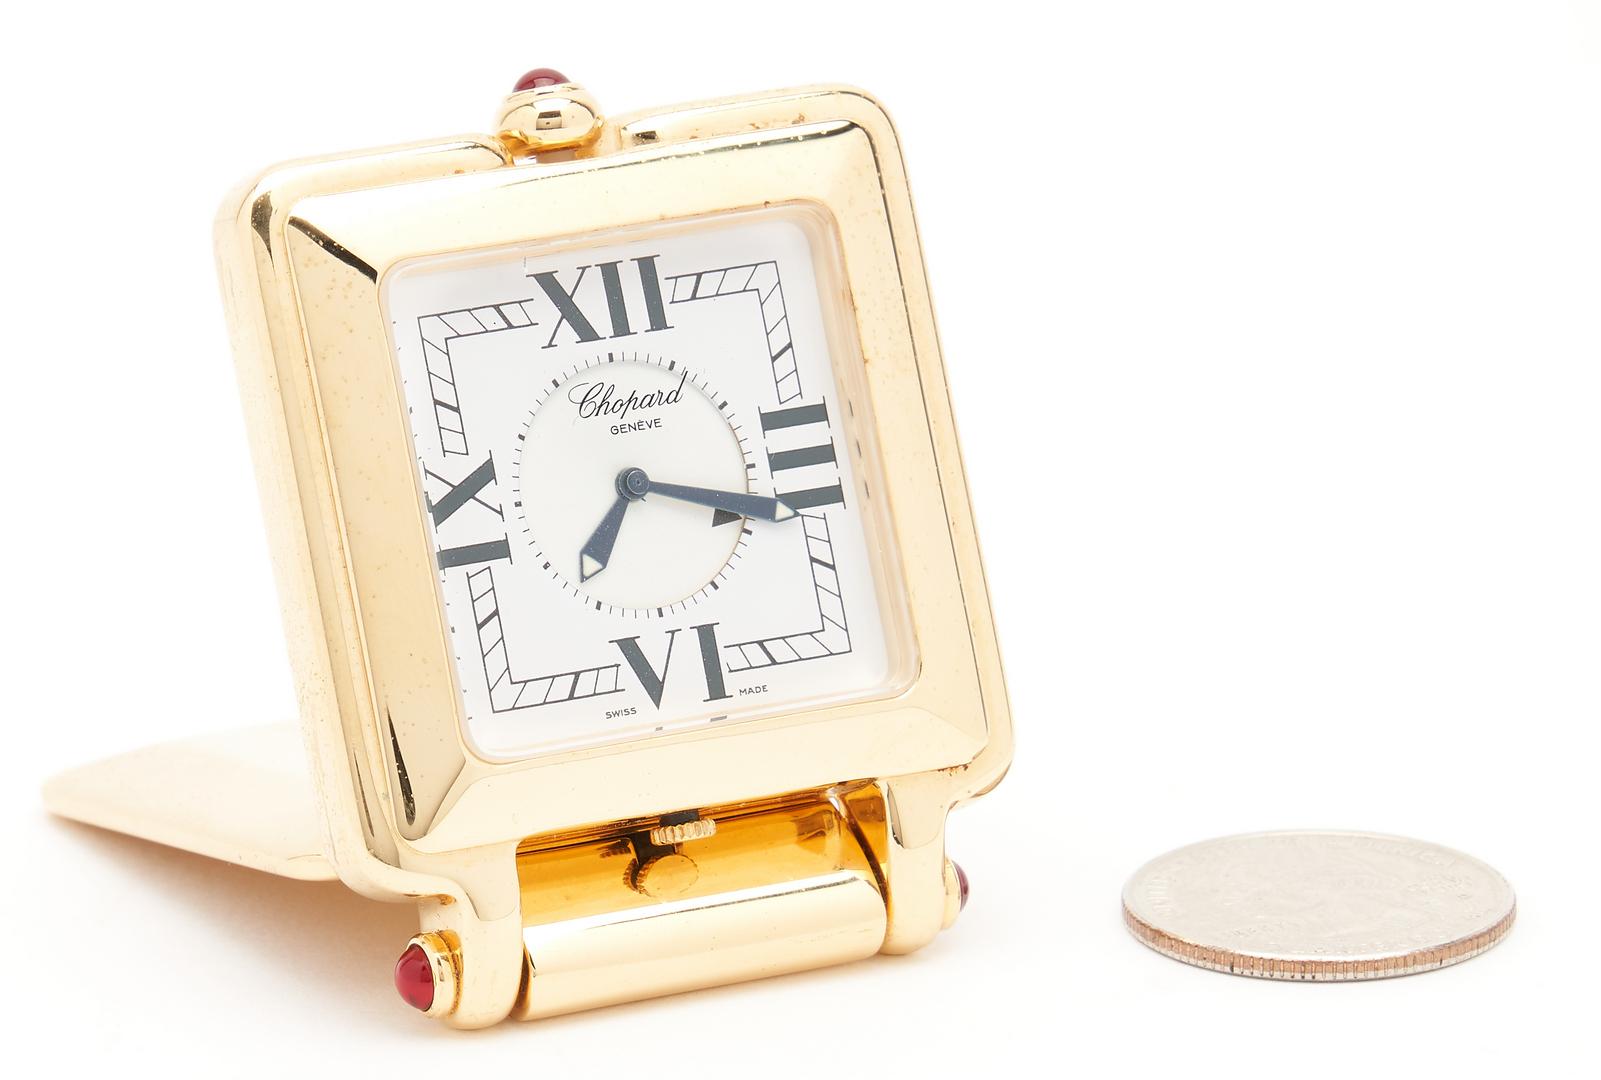 Lot 701: 2 Vintage Cartier Clocks & 1 Chopard Happy Day Travel Clock